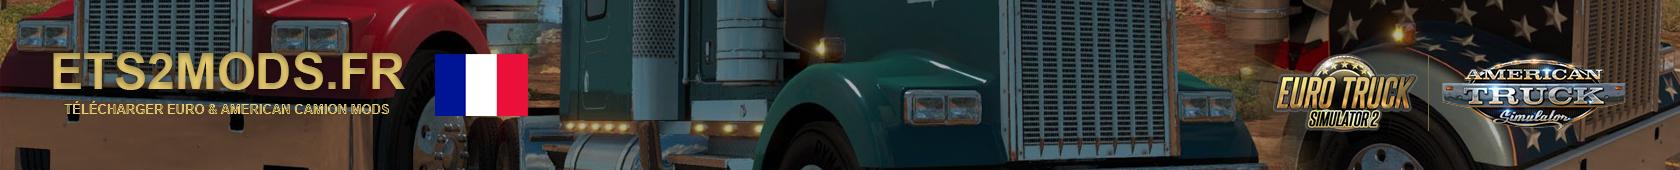 Euro Truck Simulator 2 mods | ETS2 Mods